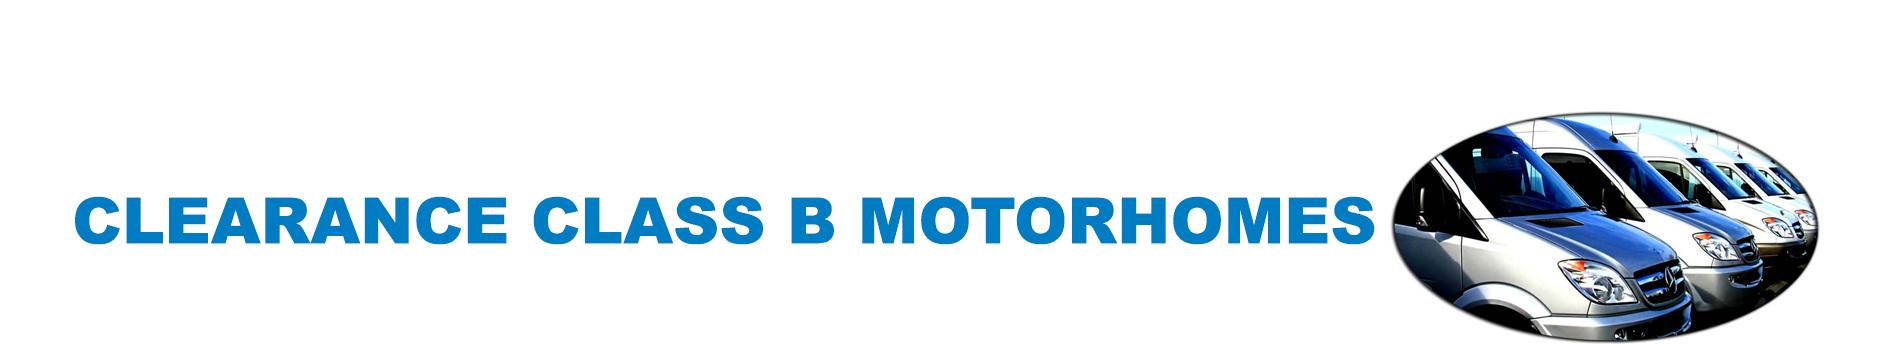 Clearance Class B Motorhomes